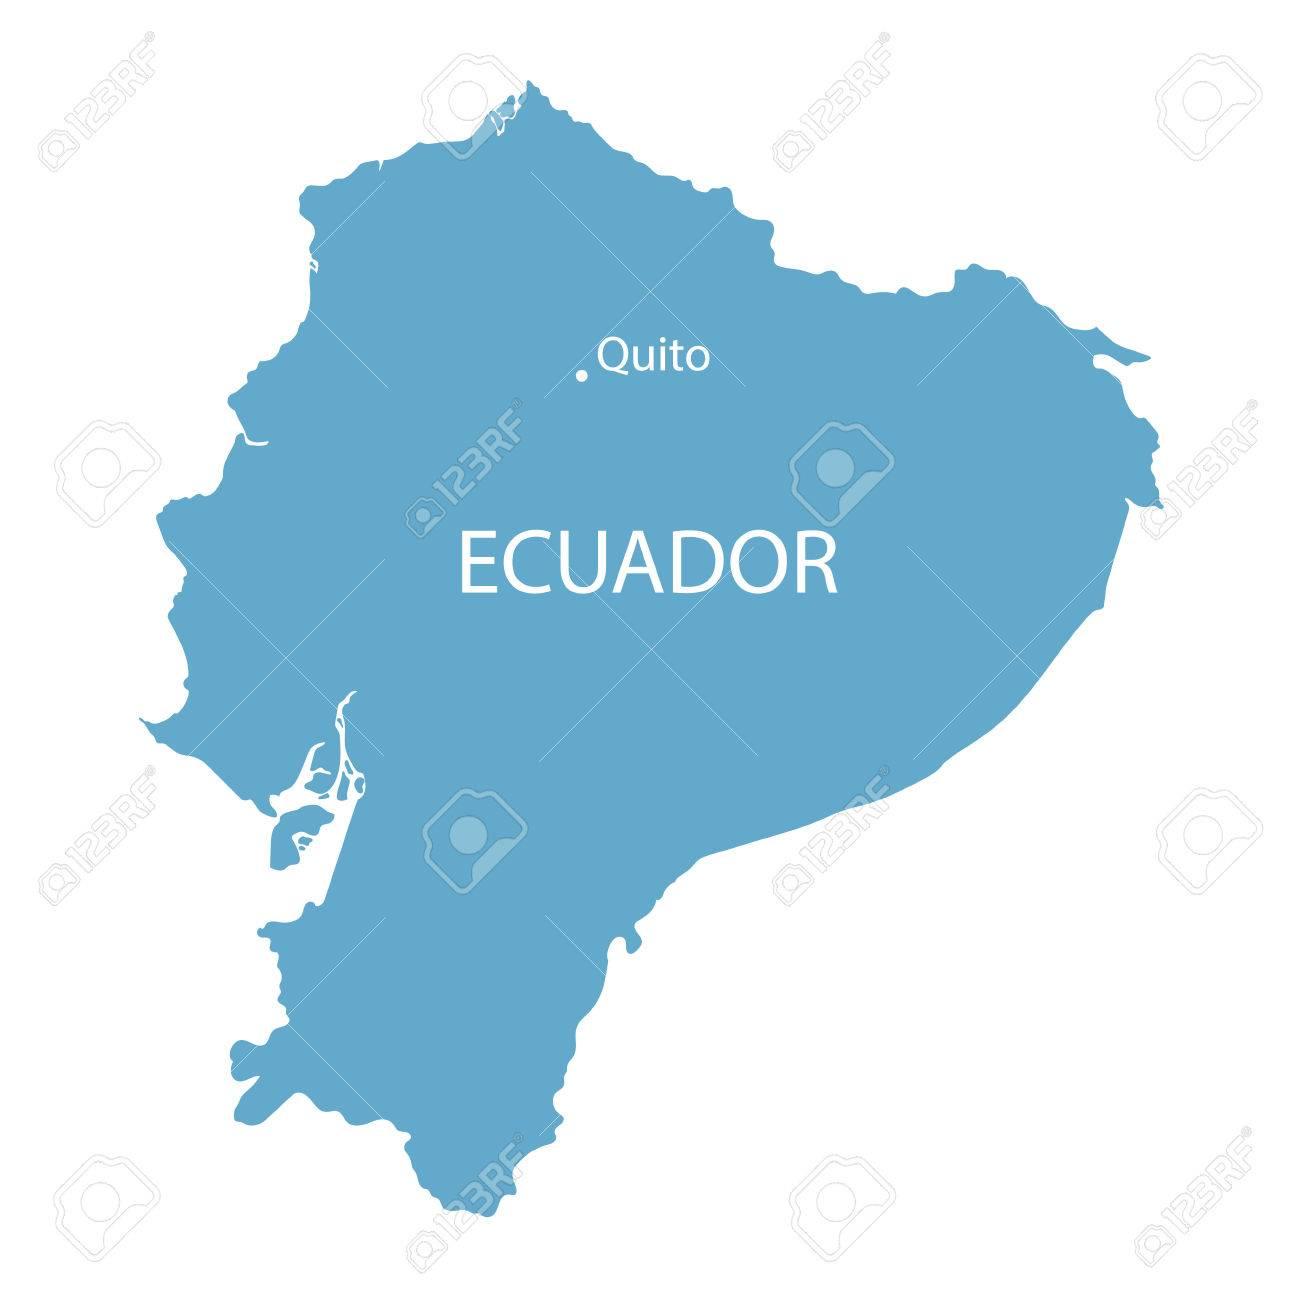 Quito clip art 1 clip art vector site blue map of ecuador with indication of quito royalty free cliparts rh 123rf com artist punta can a quito ecuador art publicscrutiny Choice Image